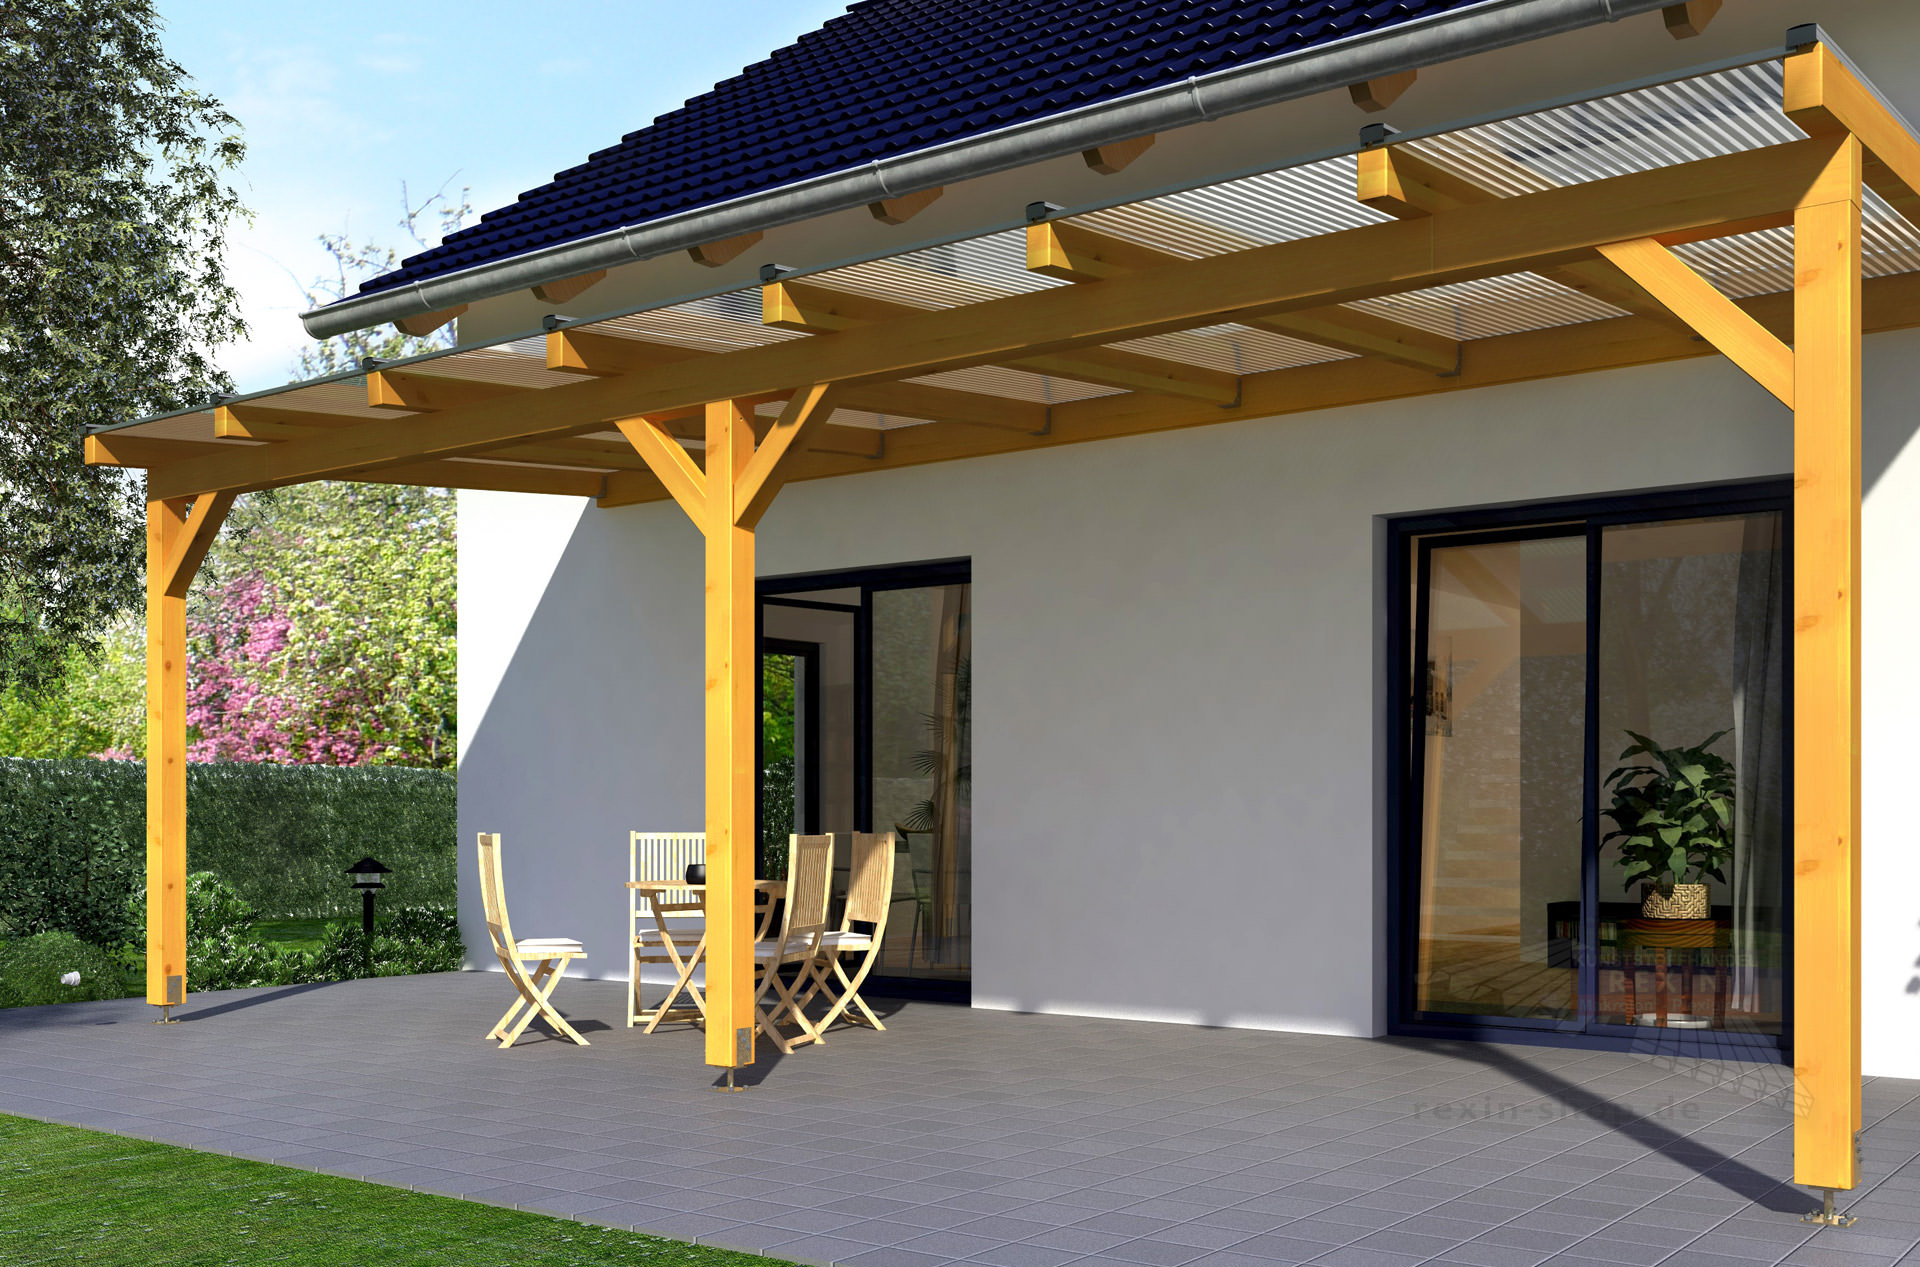 REXOcomplete Holz Terrassenüberdachung 6m x 4m ▷ Rexin-Shop